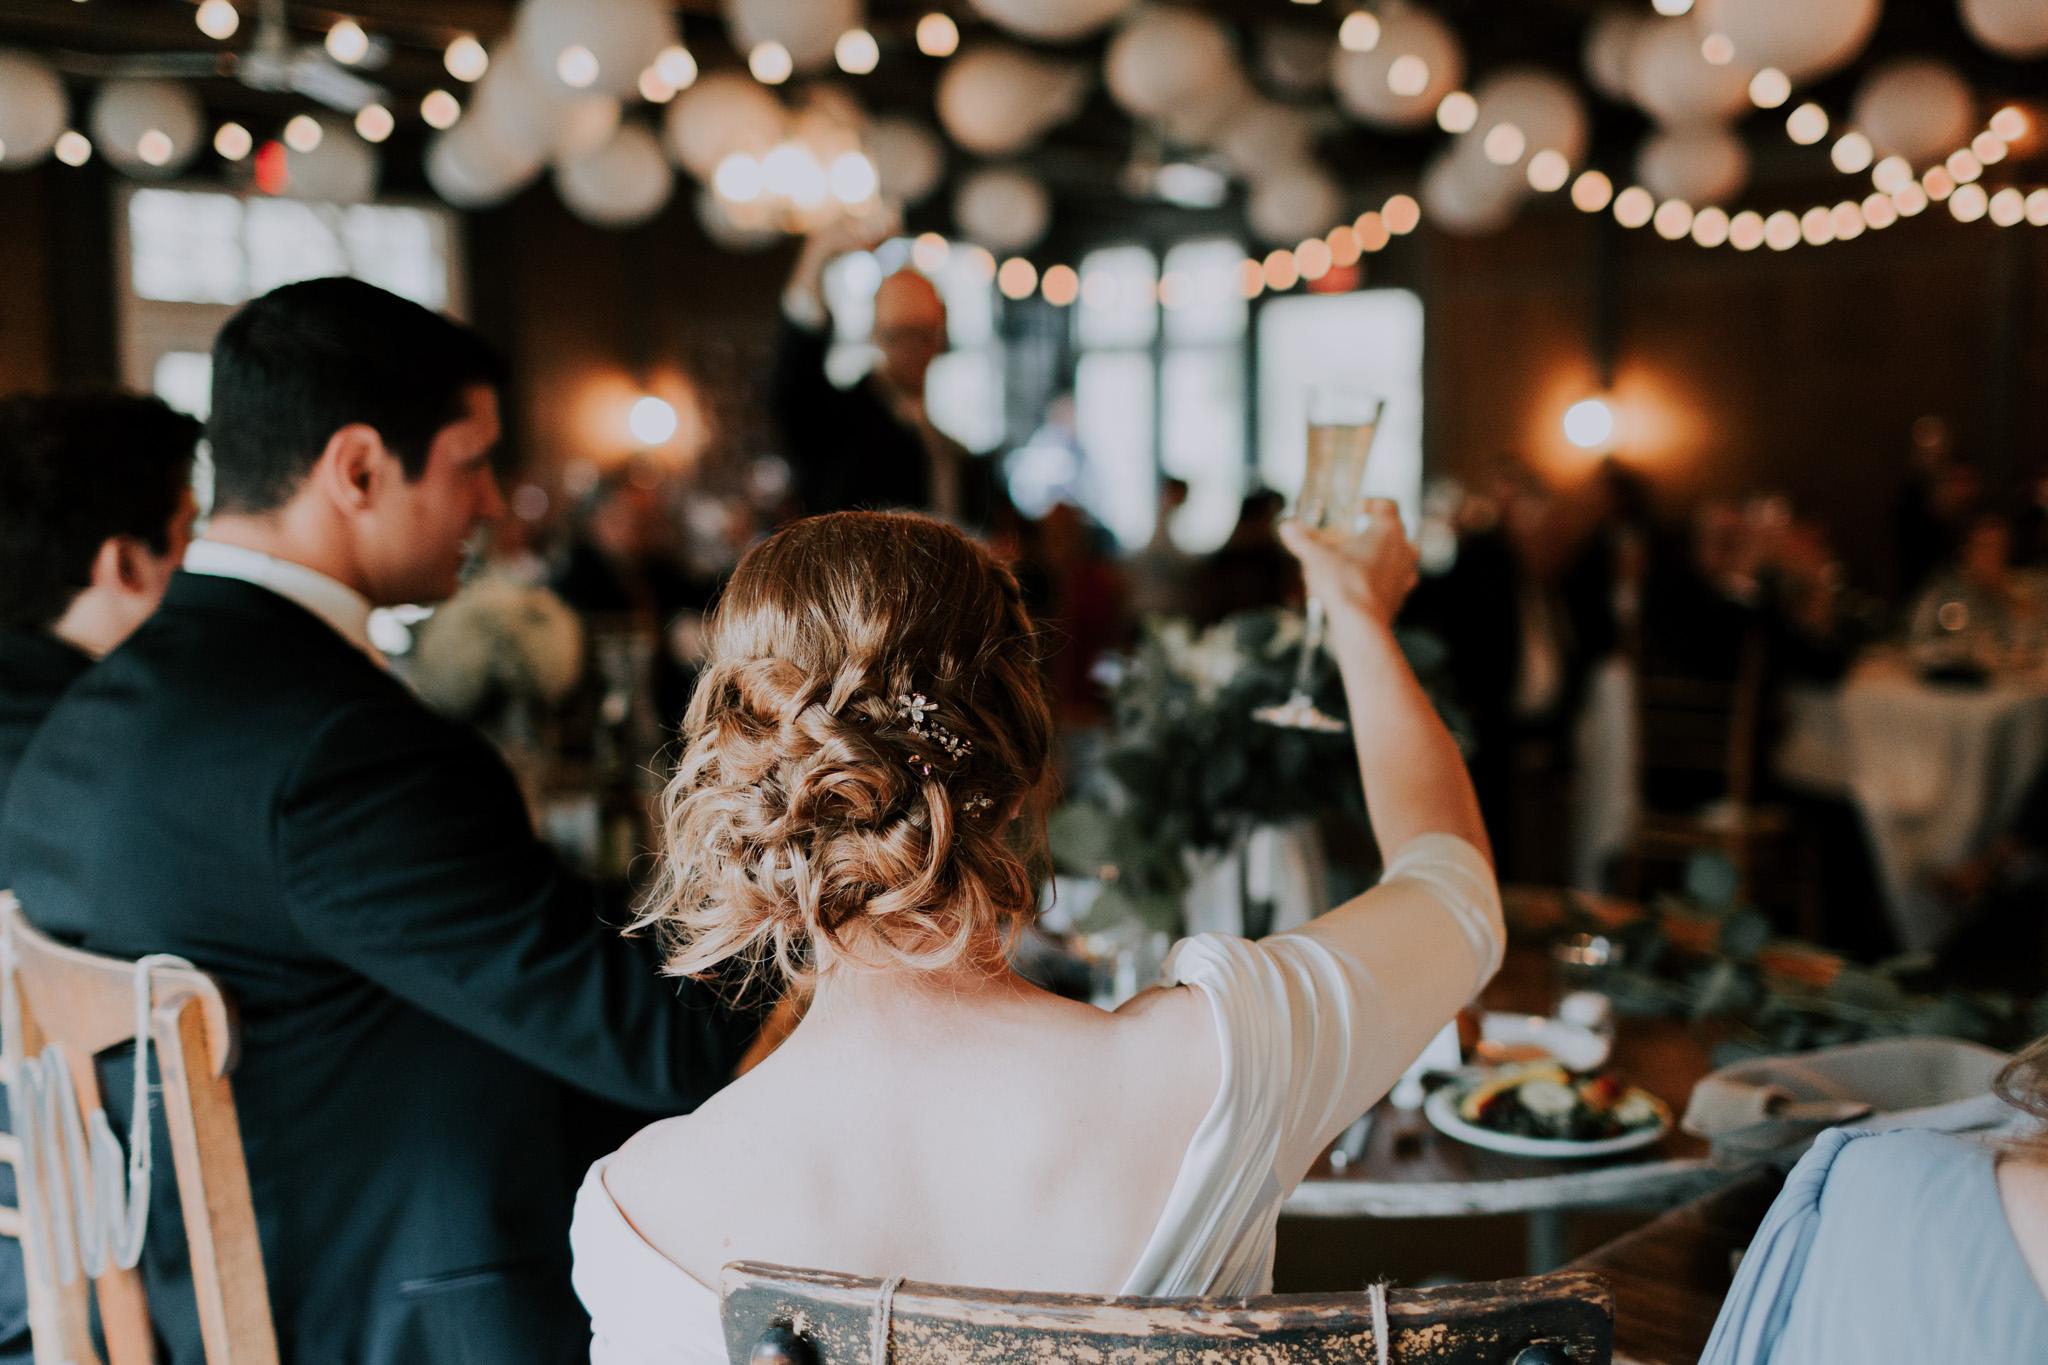 MillCreek-Wilde-Wedding-Barn-Michigan-Eliza-Eric-Vafa-Photo962.jpg